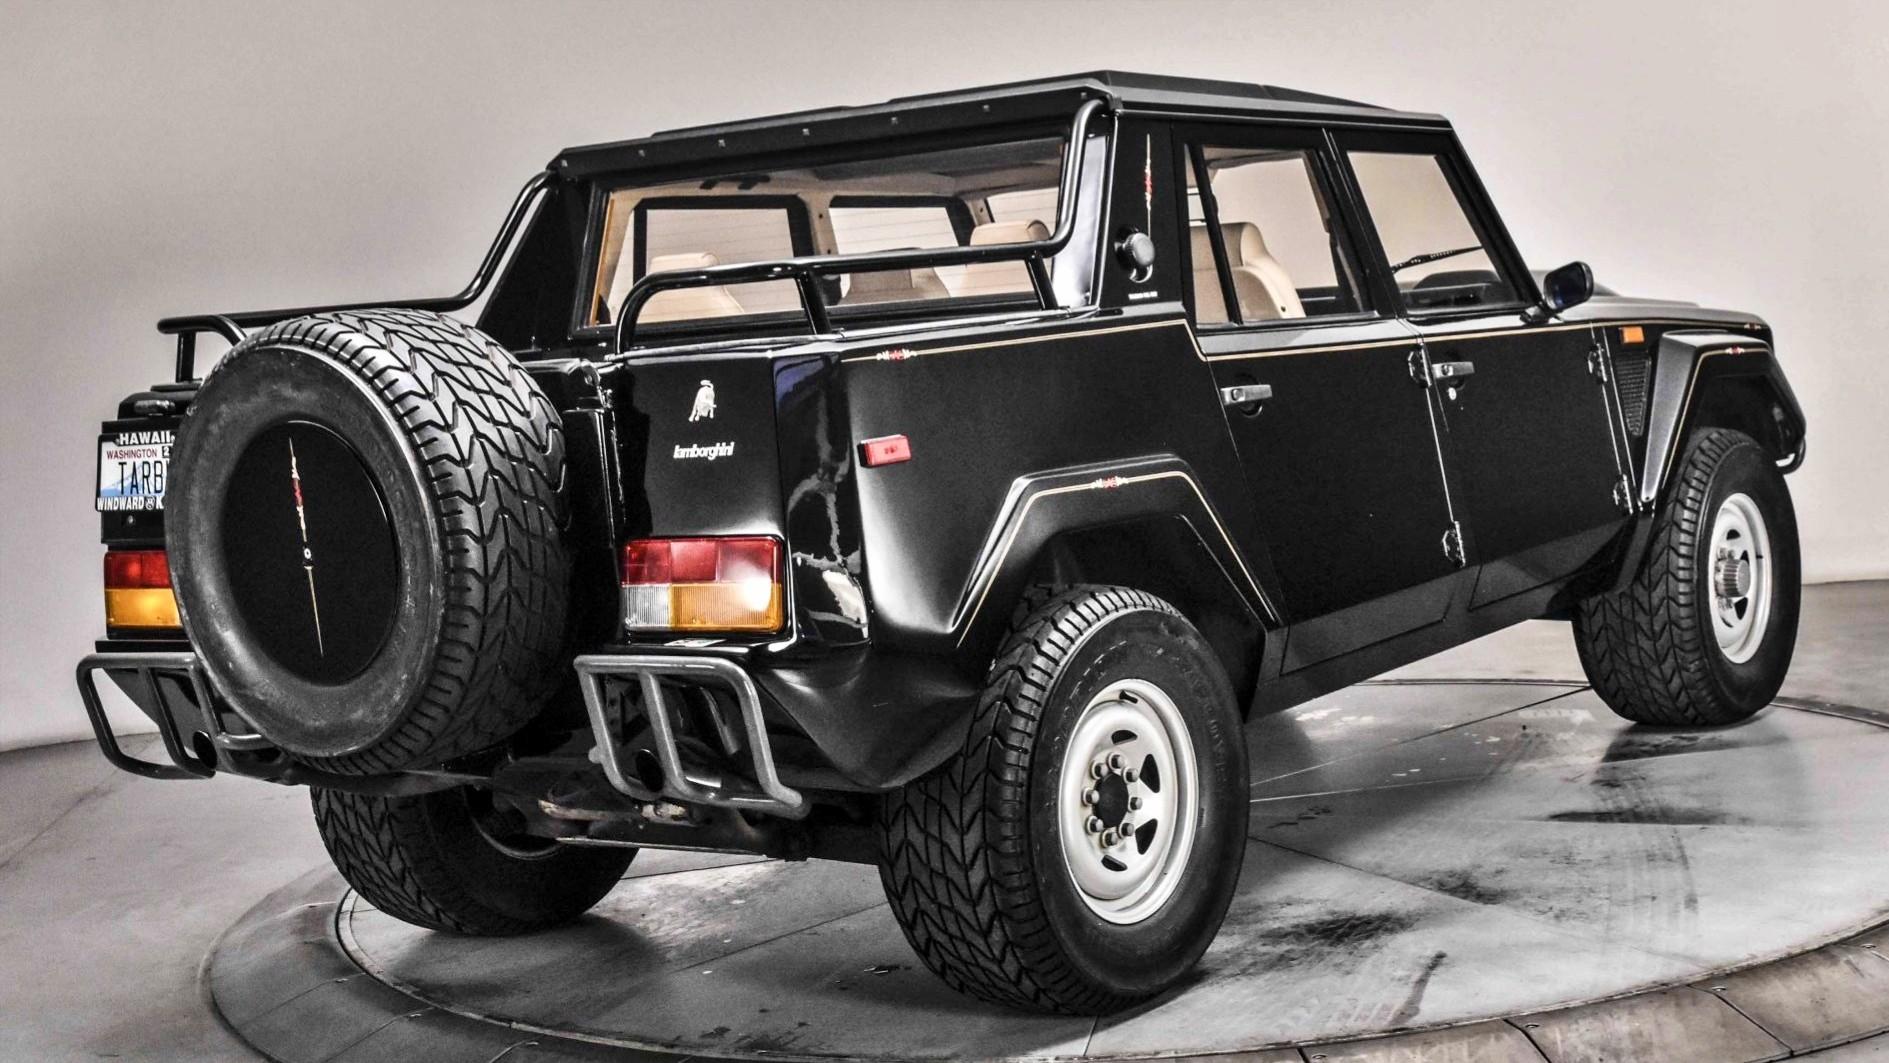 Он вам не Urus: раритетный Lamborghini LM002 почти без пробега выставлен на продажу